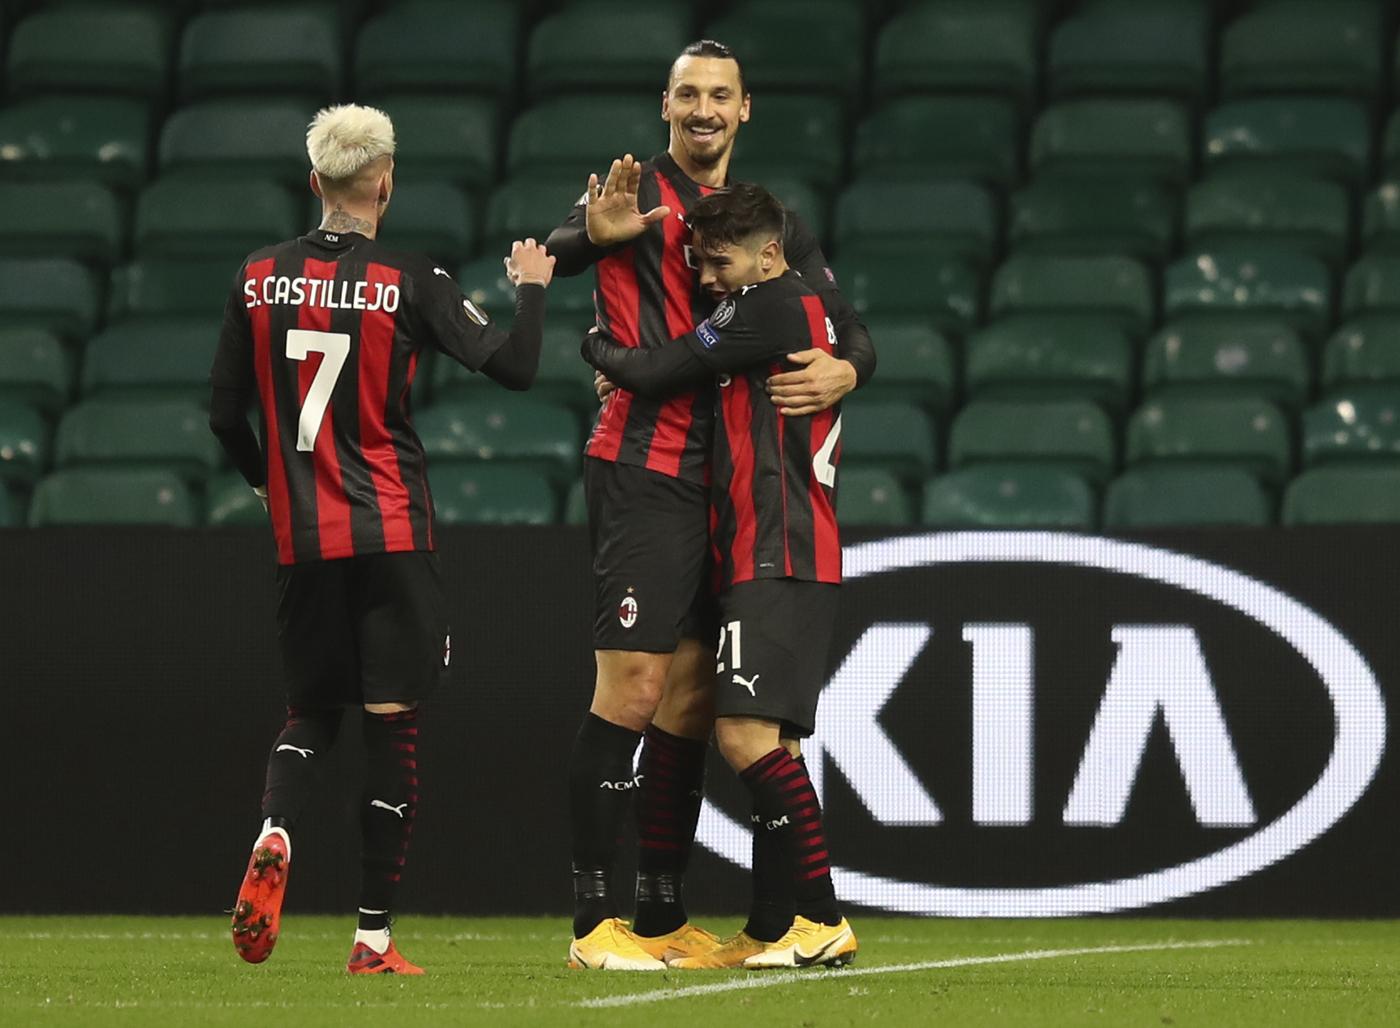 Pagelle Milan Stella Rossa 1 1: Kessie straordinario, Romagnoli flop | Europa League News